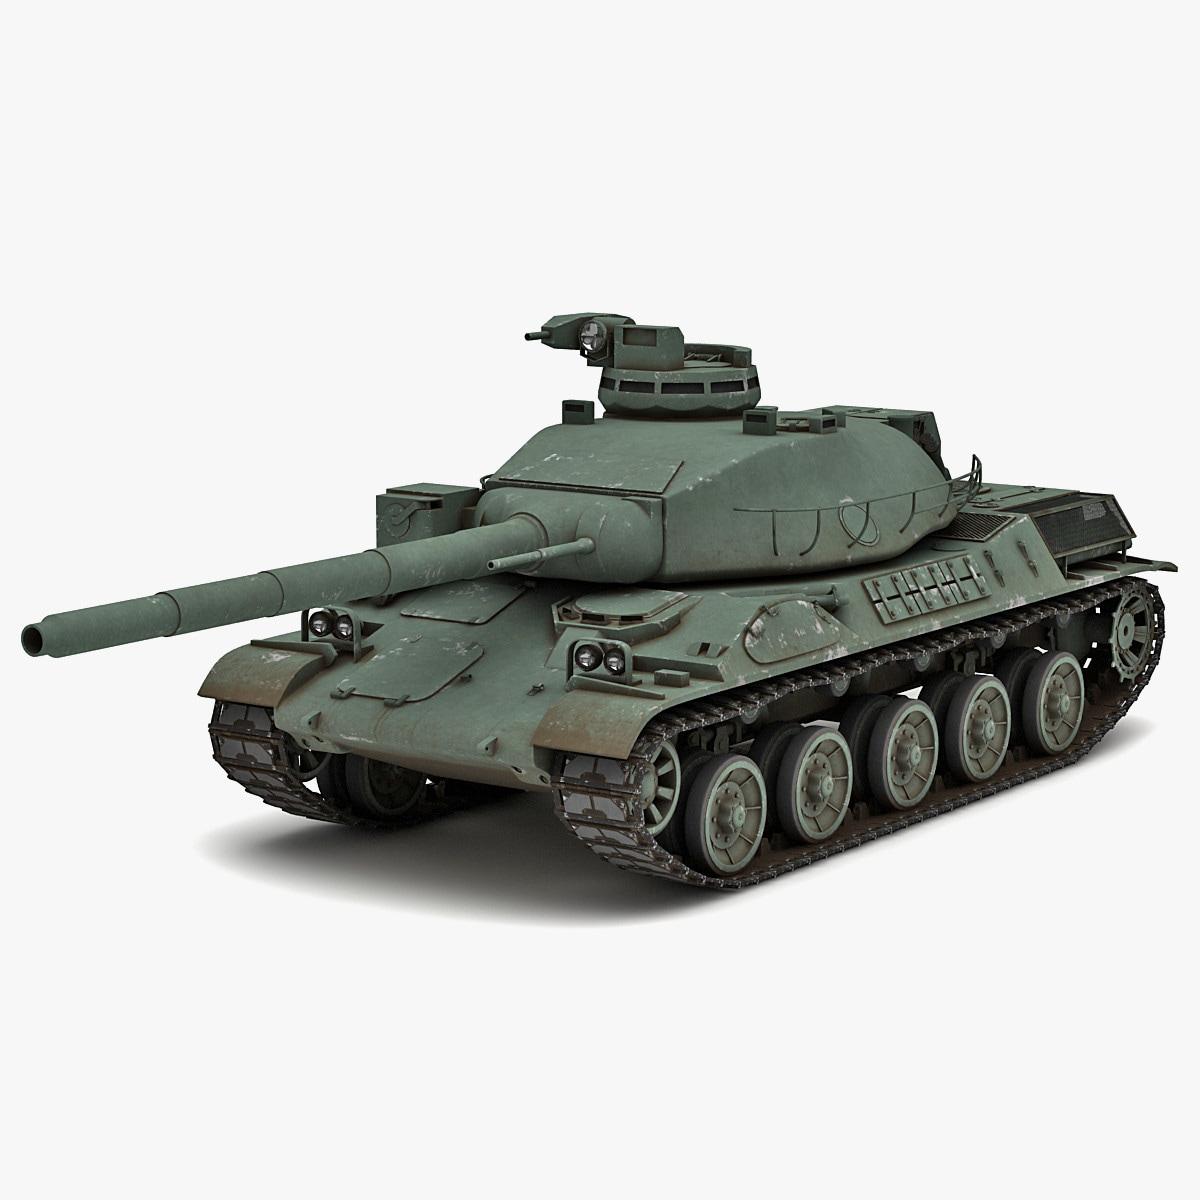 180744_AMX32_France_Main_Battle_Tank_2___0001.jpg7238b47e-1761-427d-a74c-b5e97367de2bOriginal.jpg